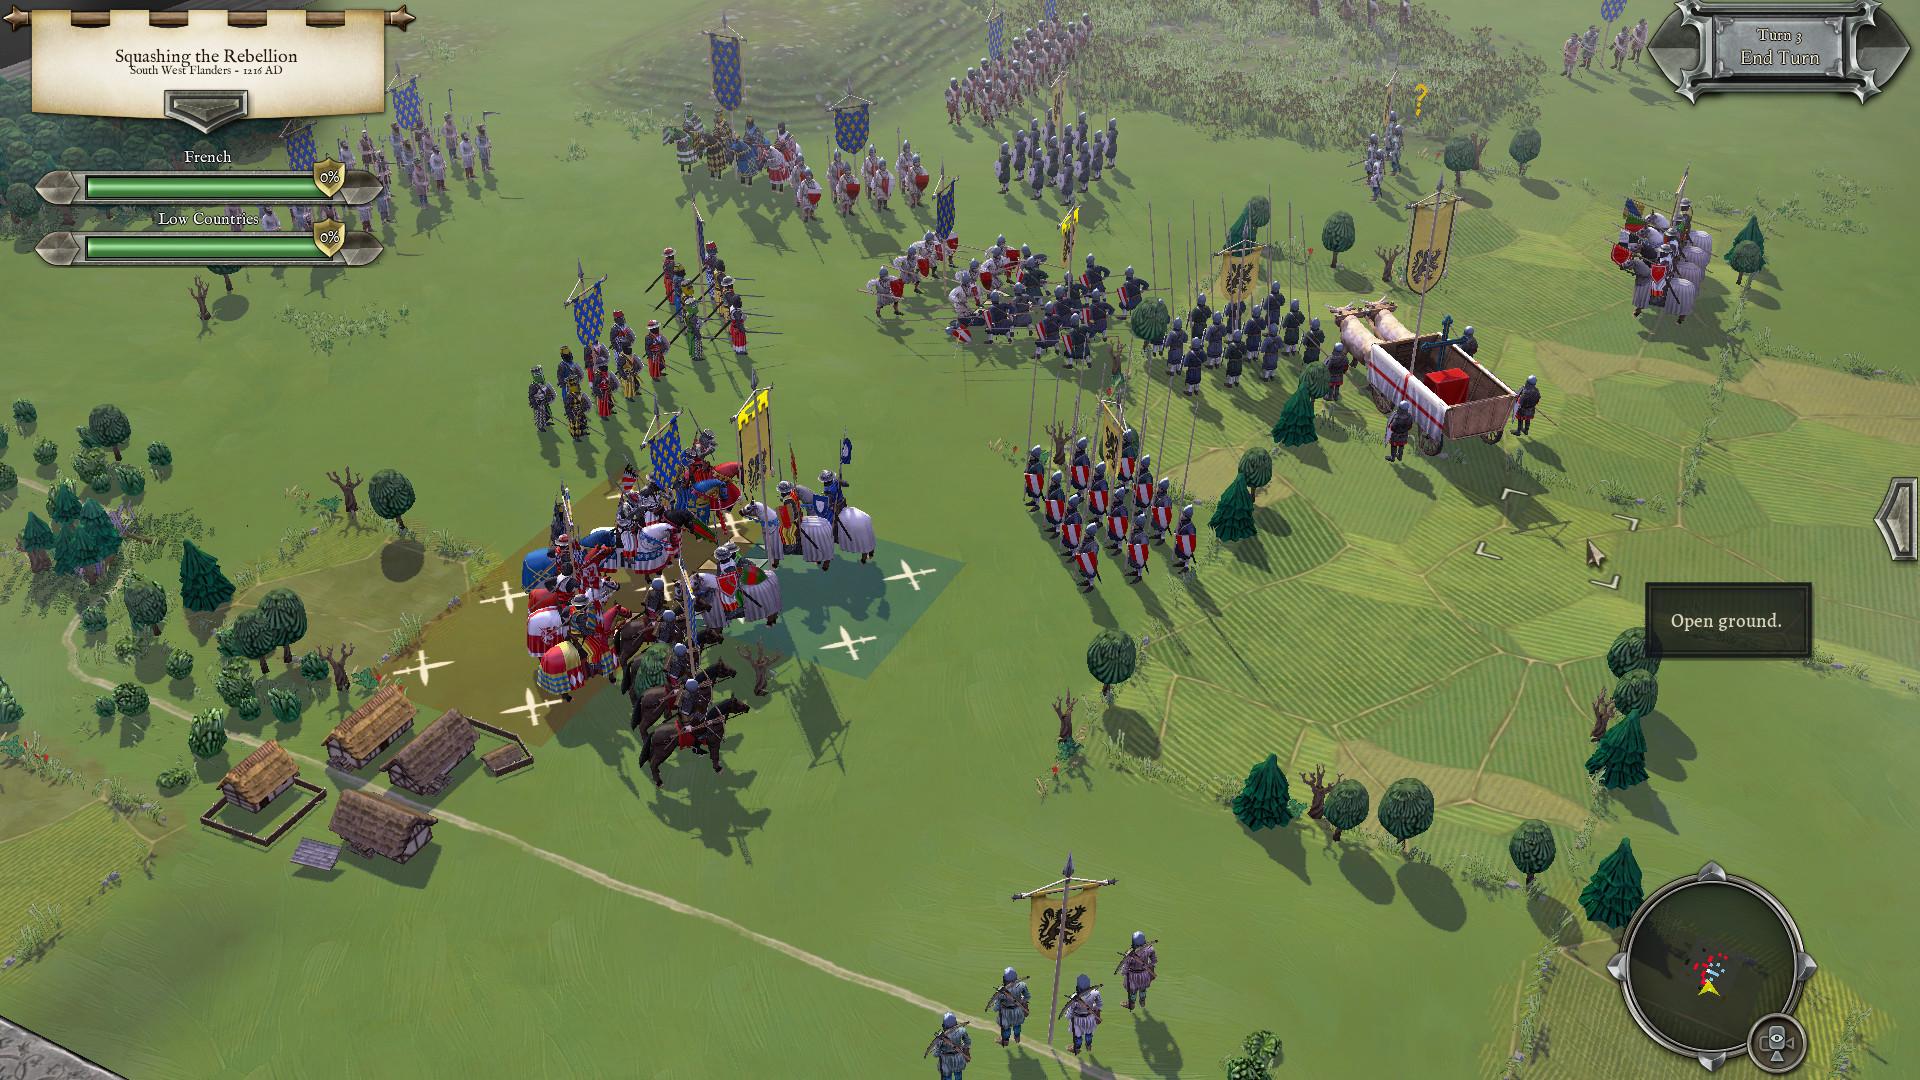 Обзор Field of Glory 2: Medieval